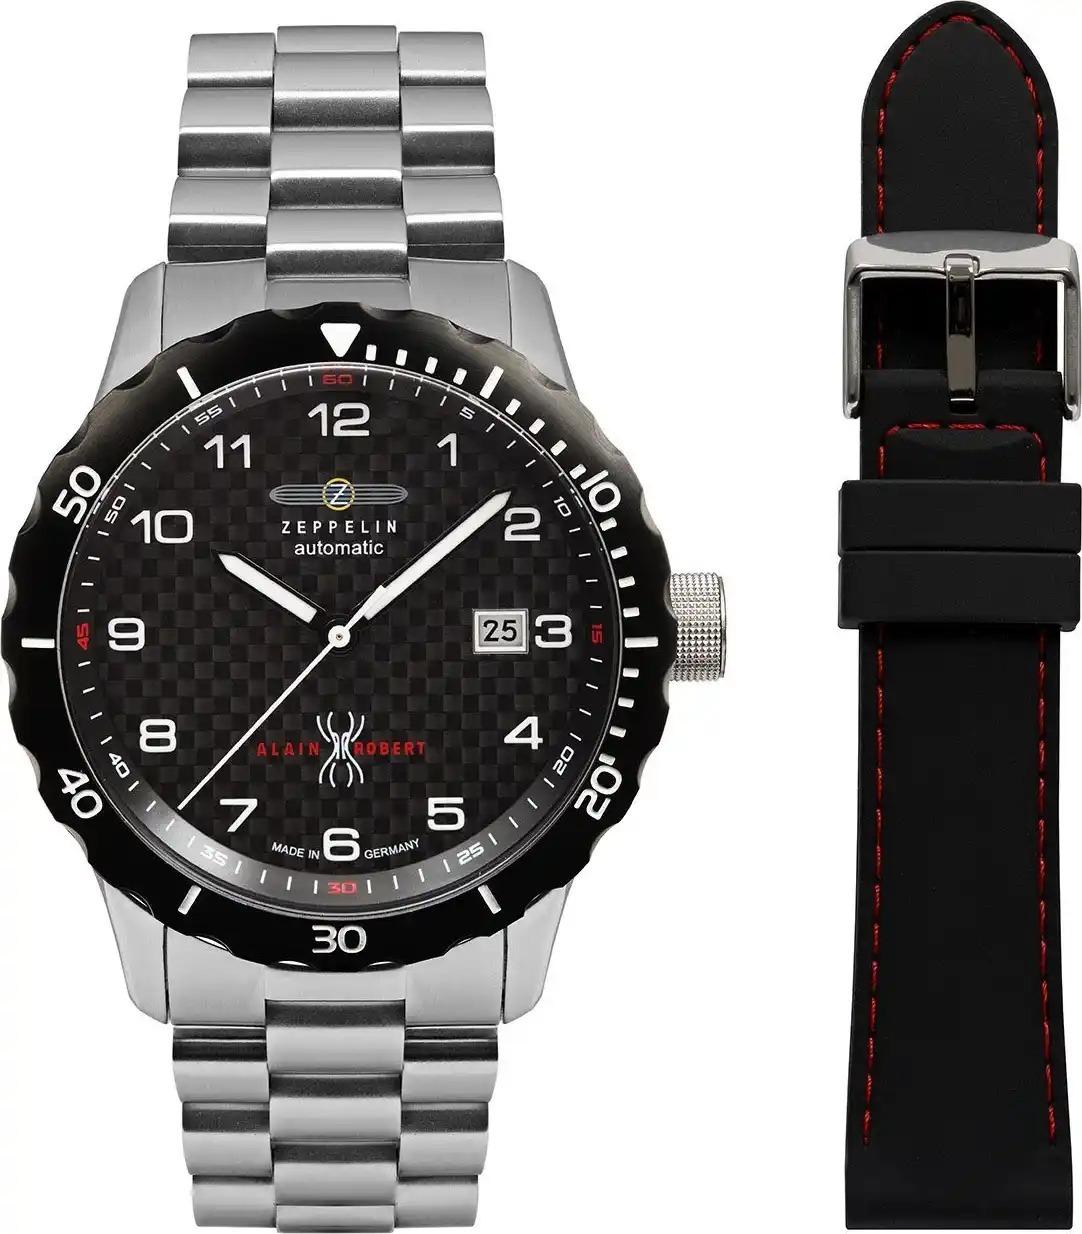 Мужские часы Zeppelin Limited Edition + ремешок 72662_set